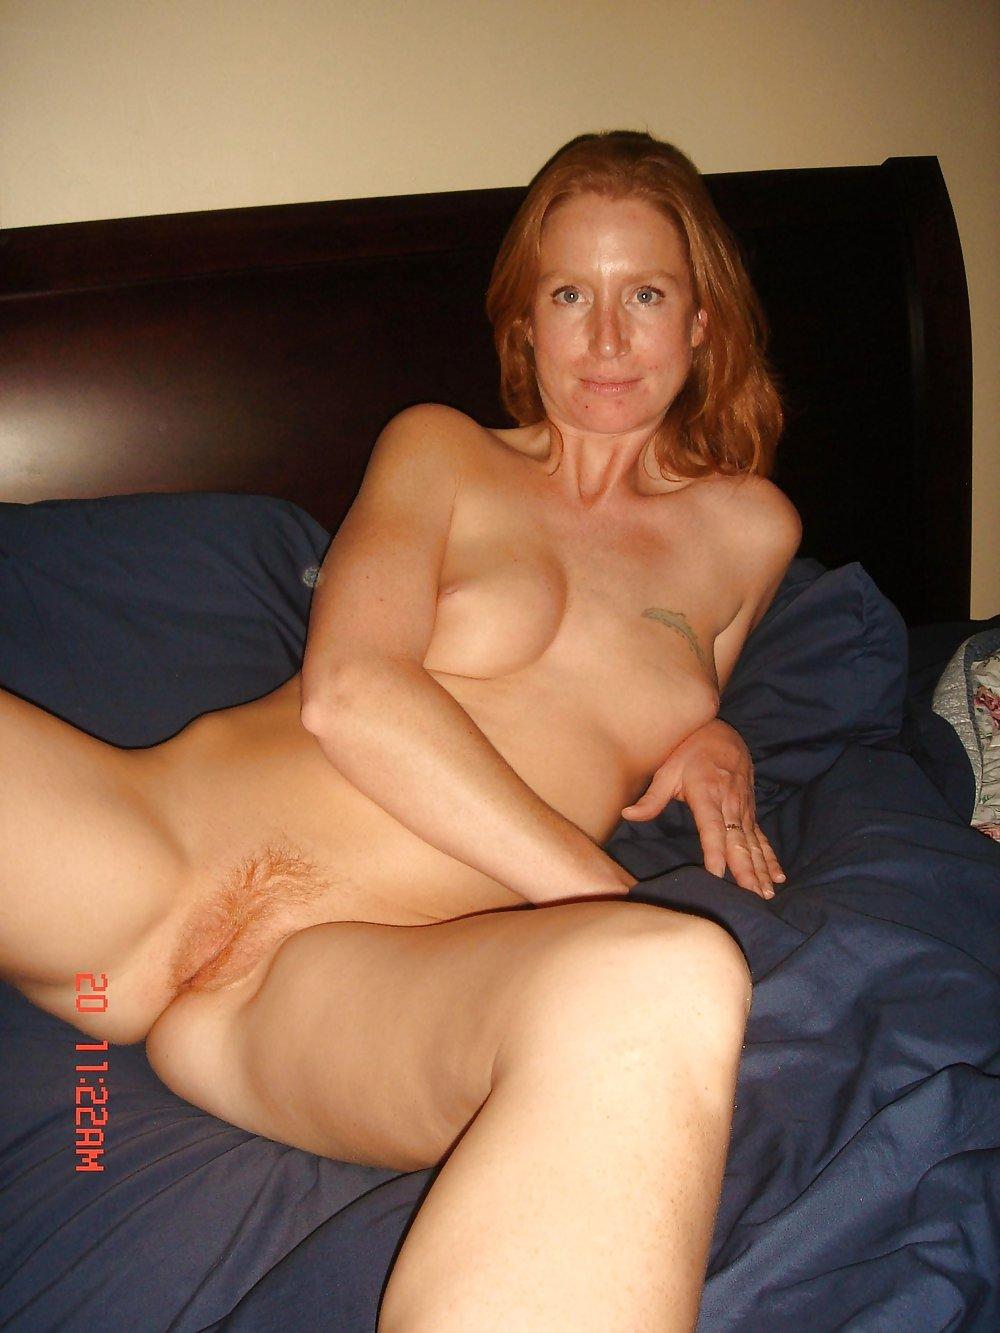 http://hotamateurmature.com/gallery/Housewives_milf_mature_elders/54.jpg